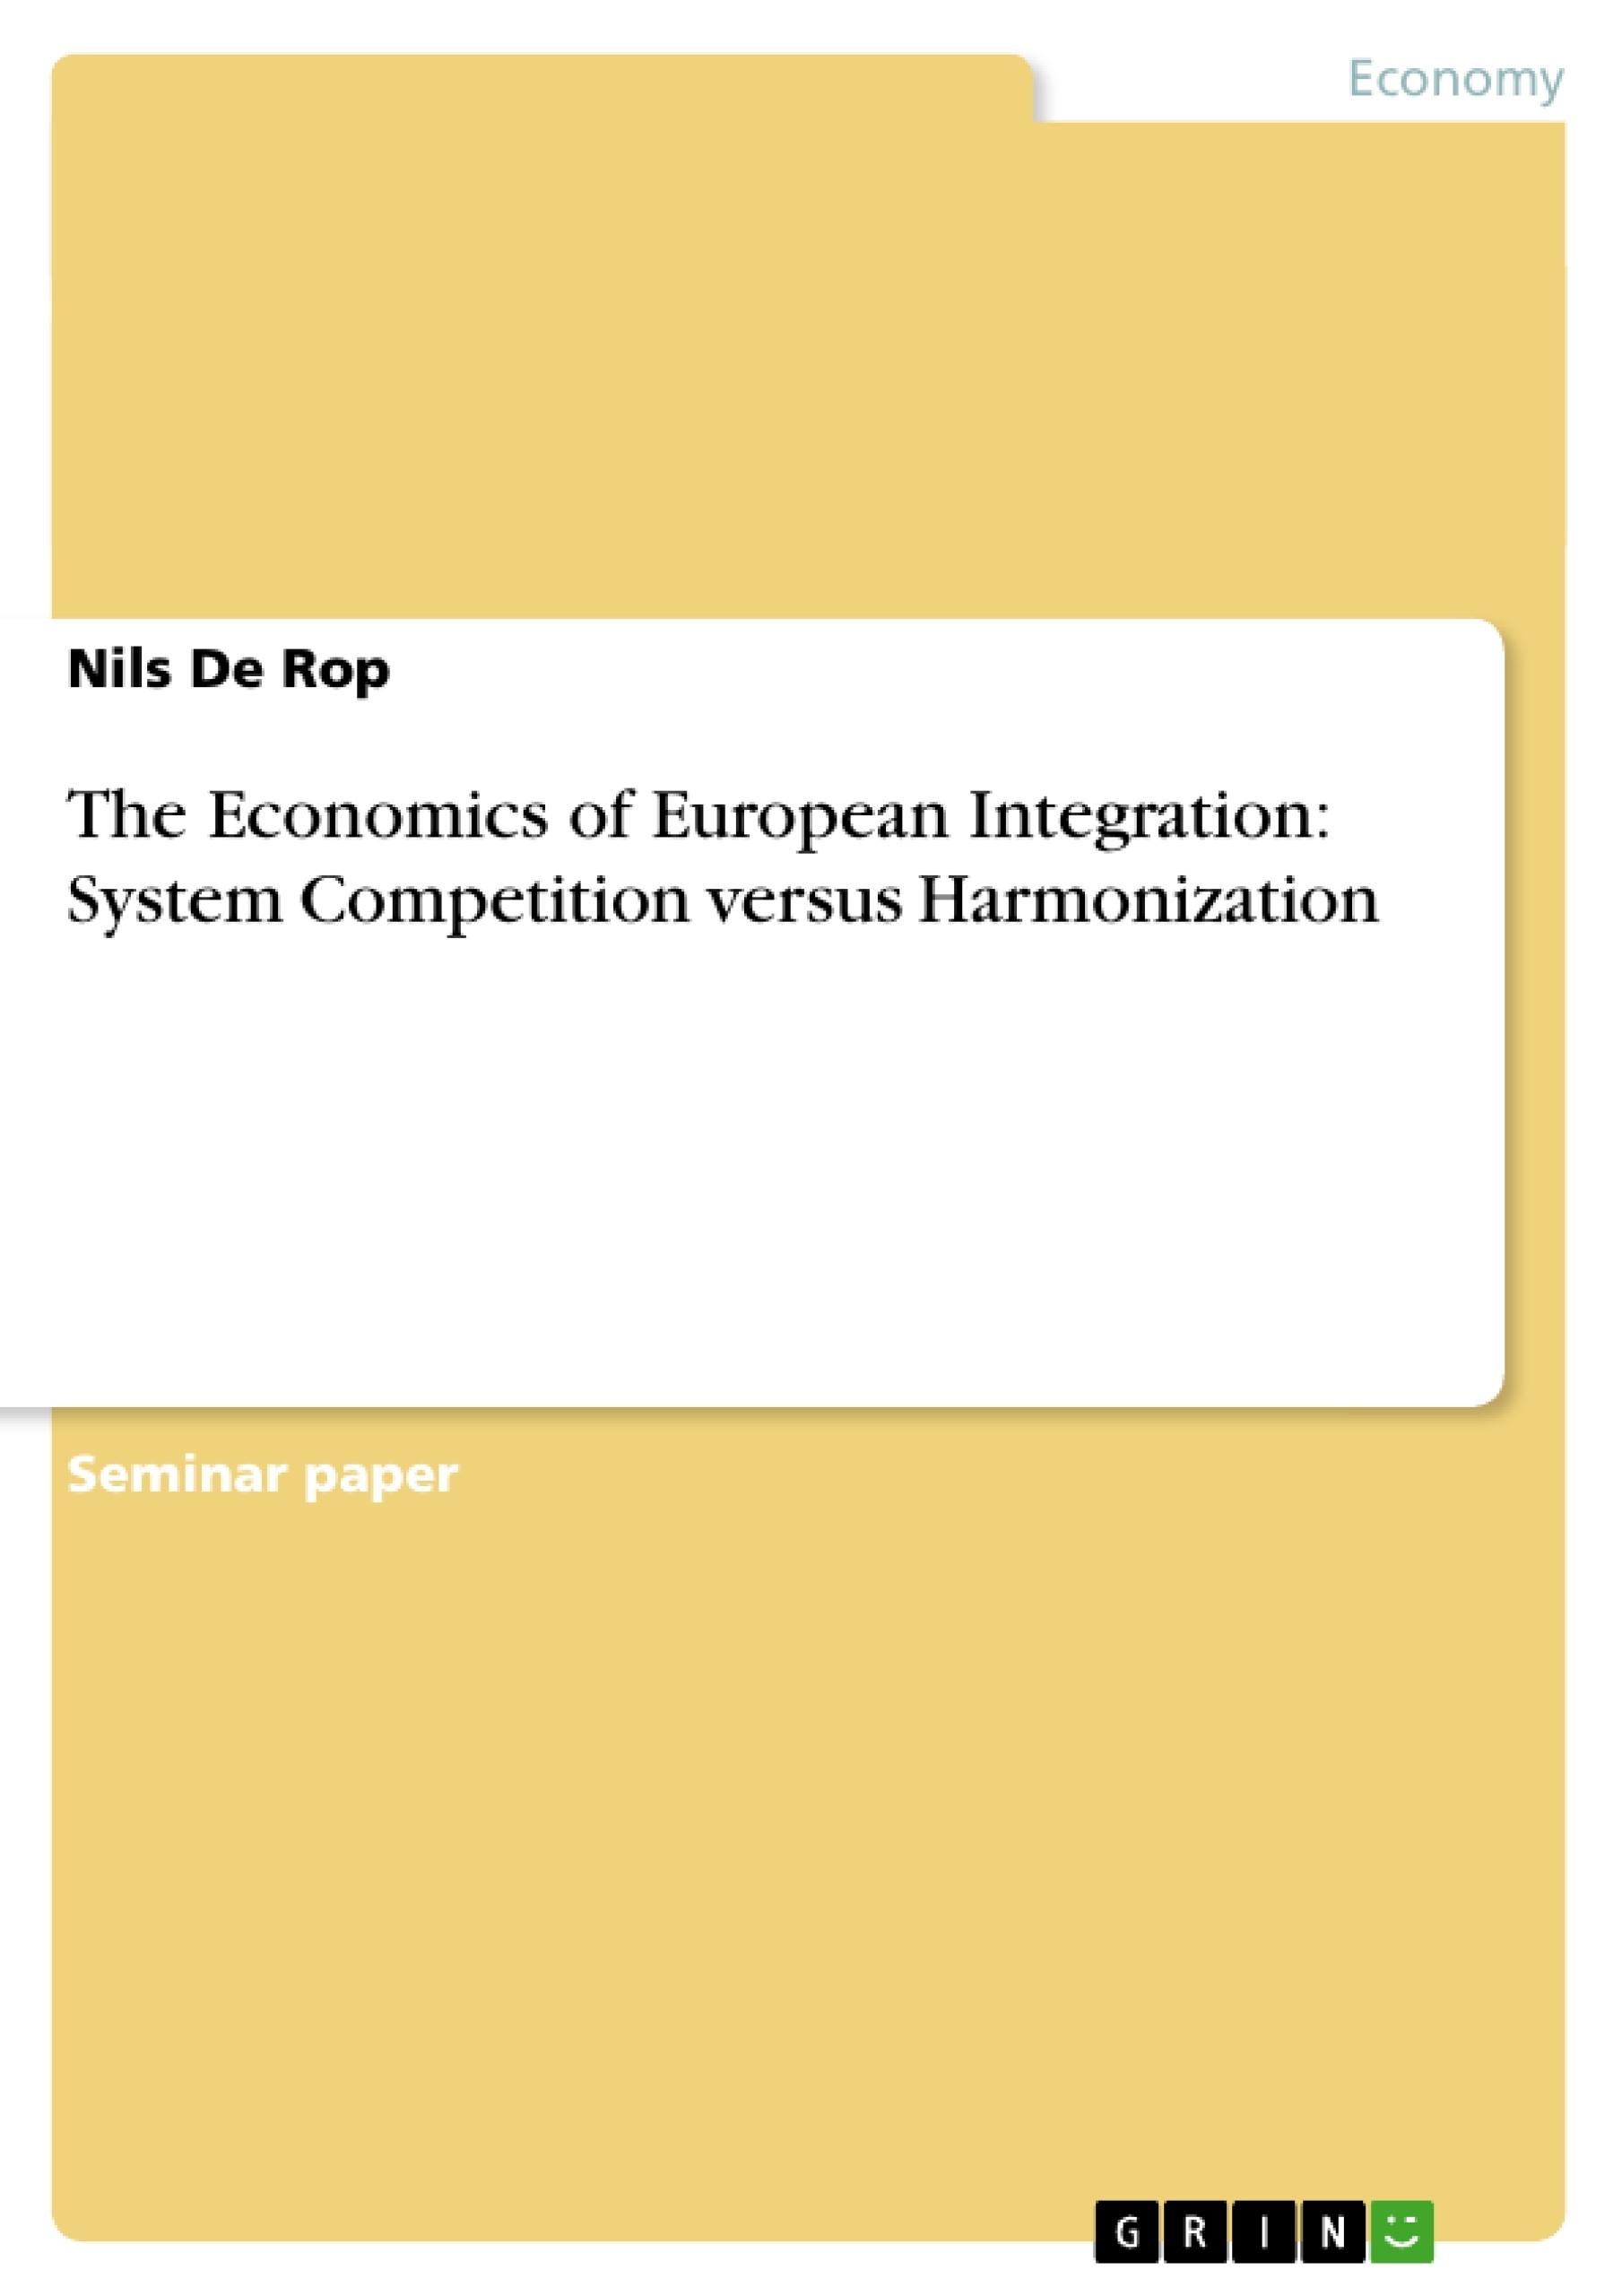 Title: The Economics of European Integration: System Competition versus Harmonization